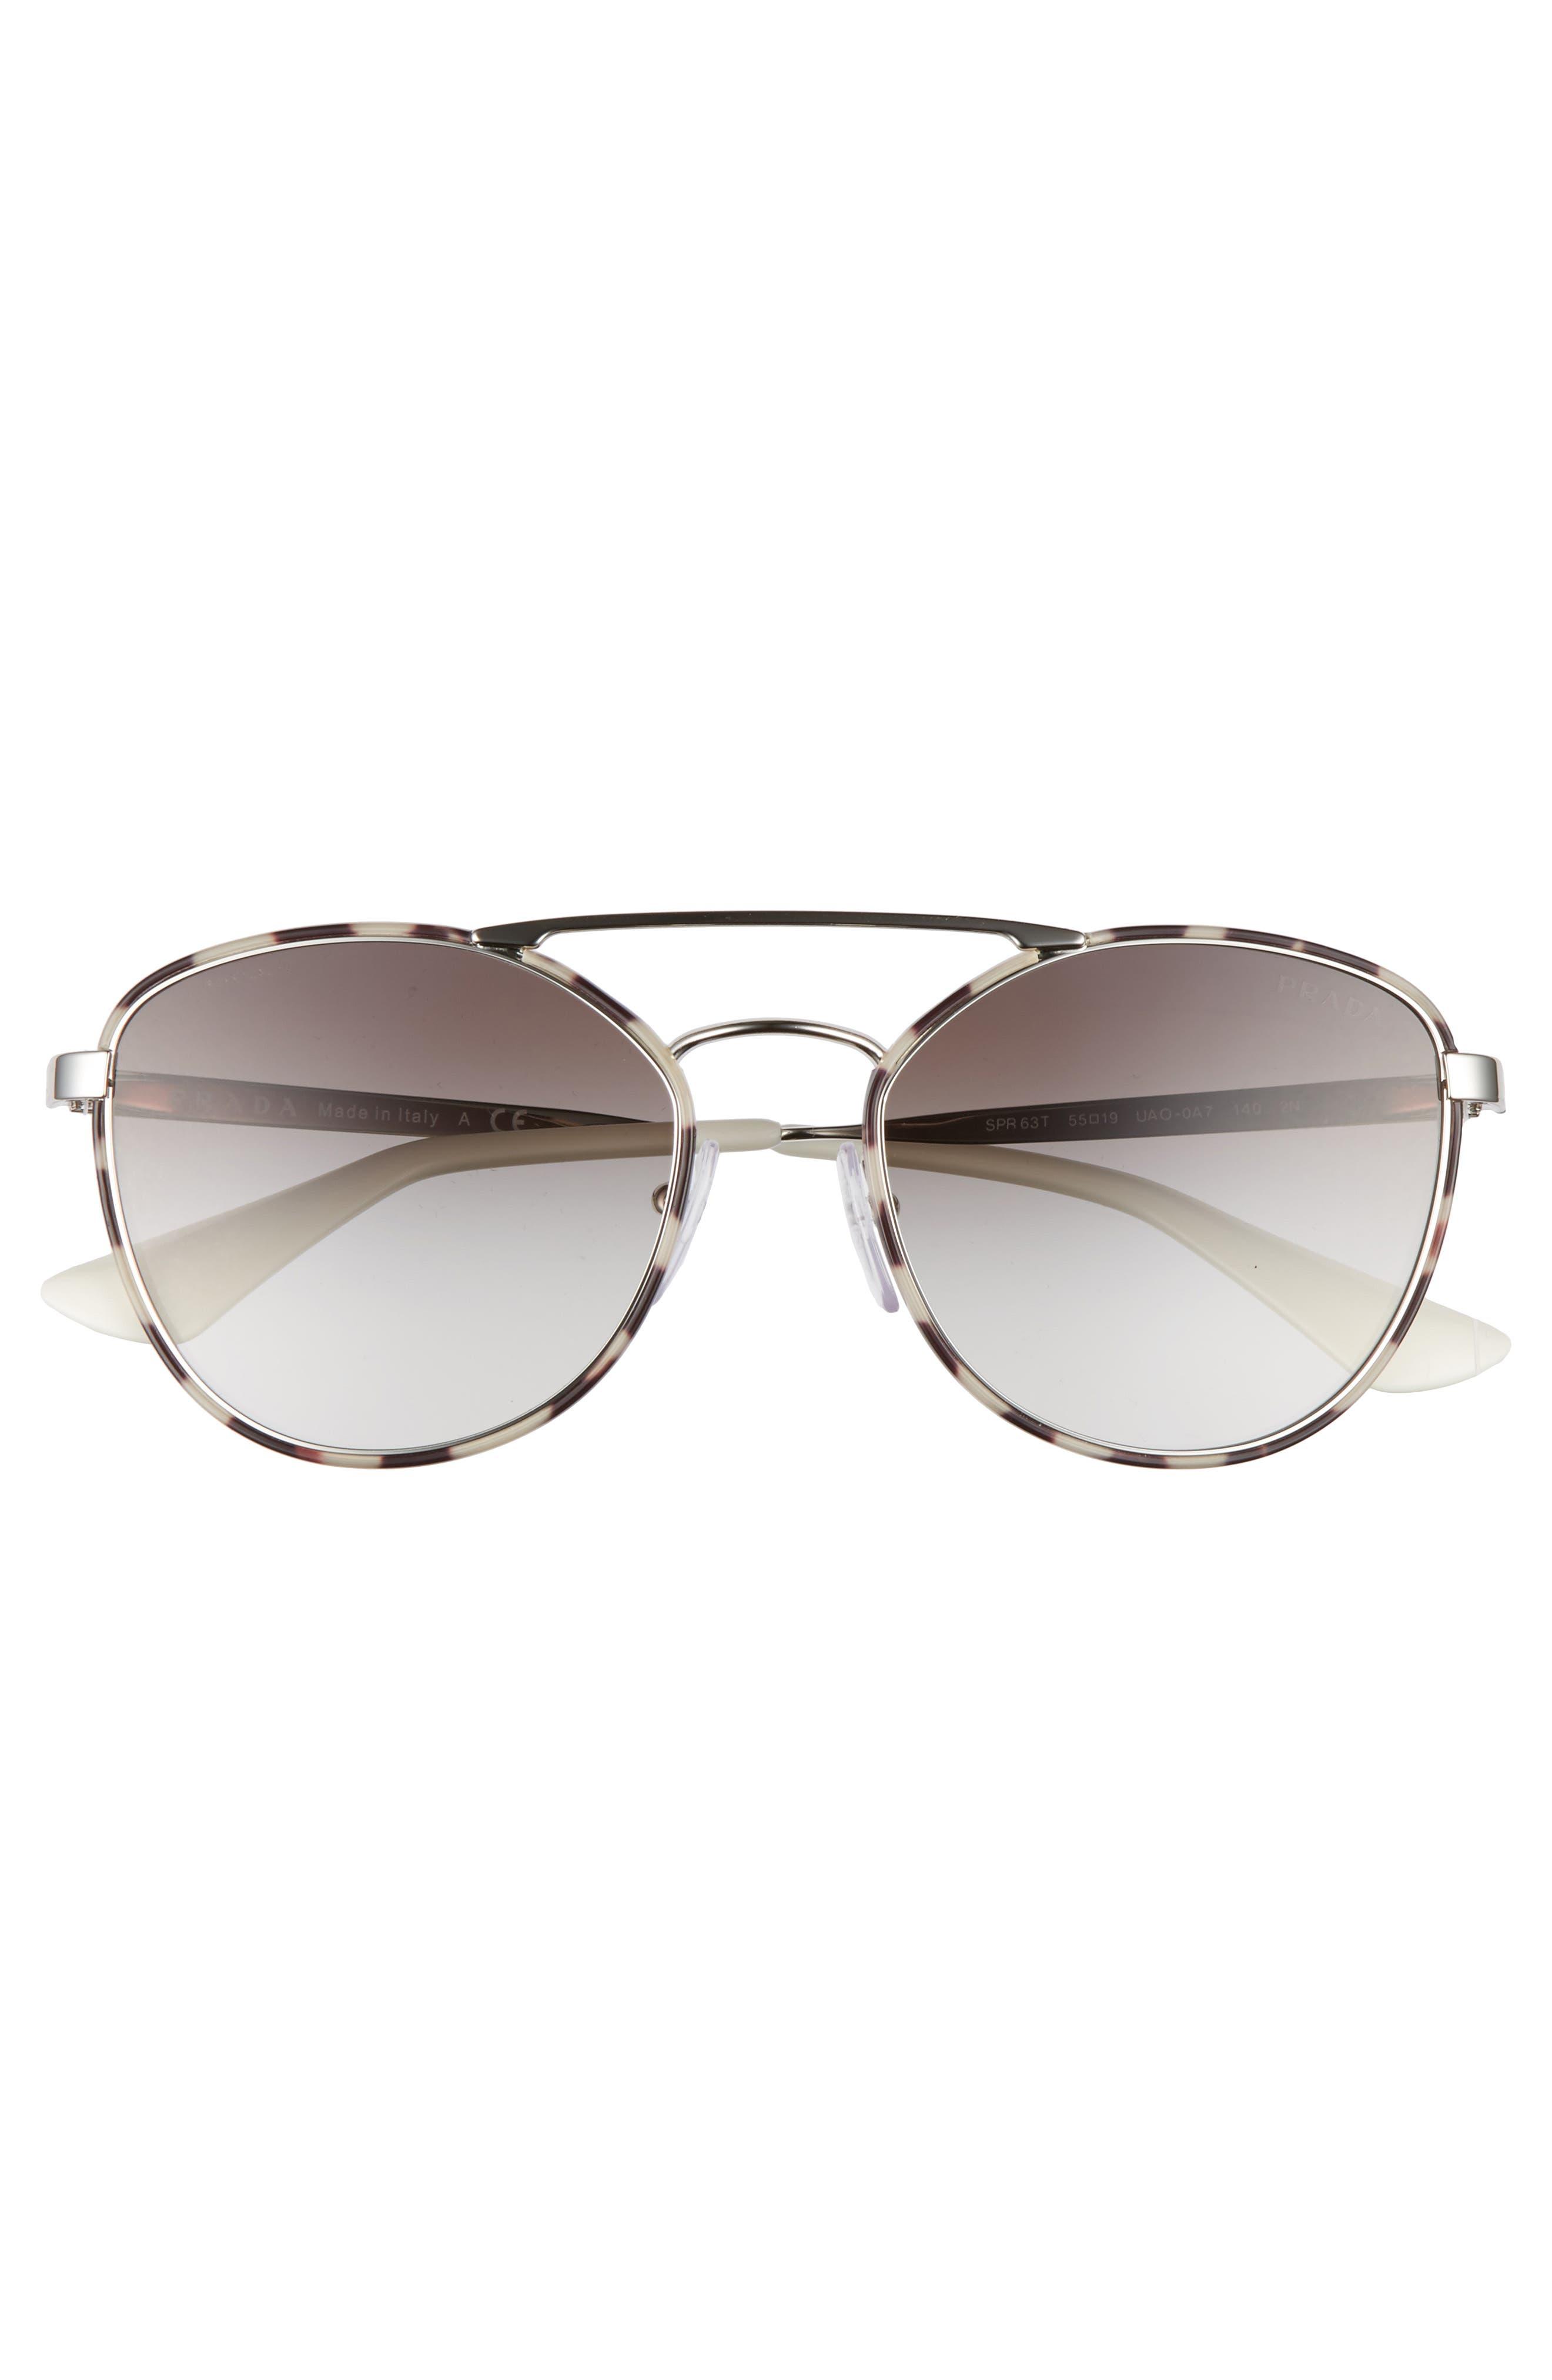 55mm Gradient Aviator Sunglasses,                             Alternate thumbnail 3, color,                             200